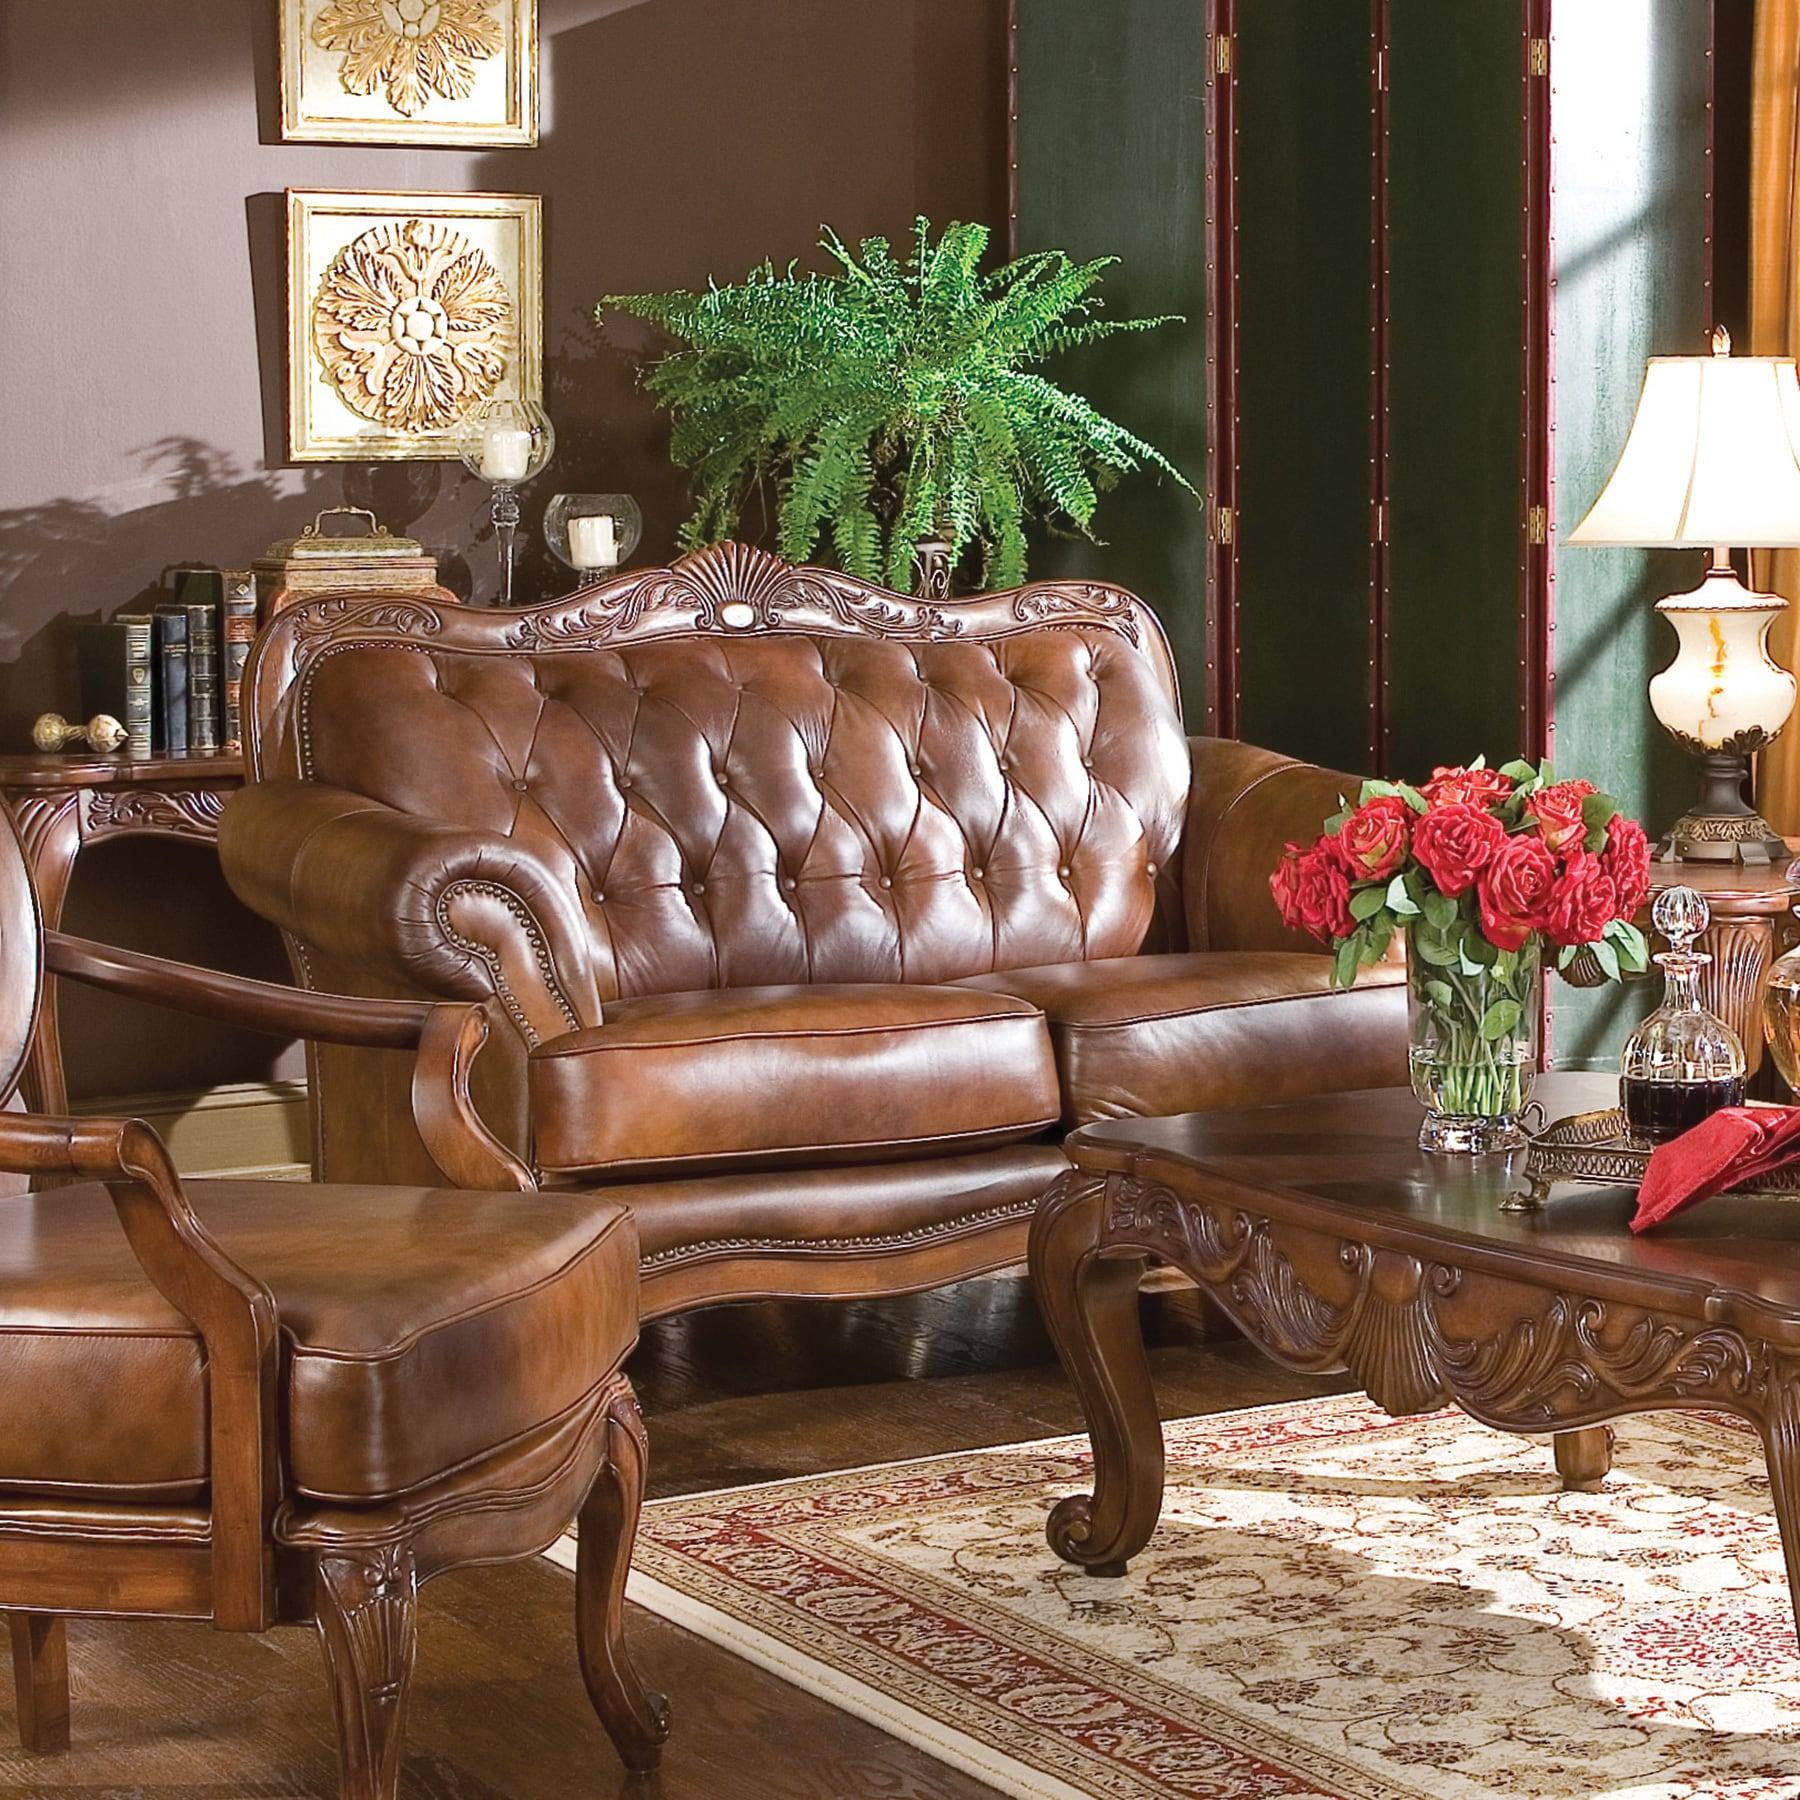 Coaster Furniture Brown Leather Tufted Victoria Sofa (Lov...